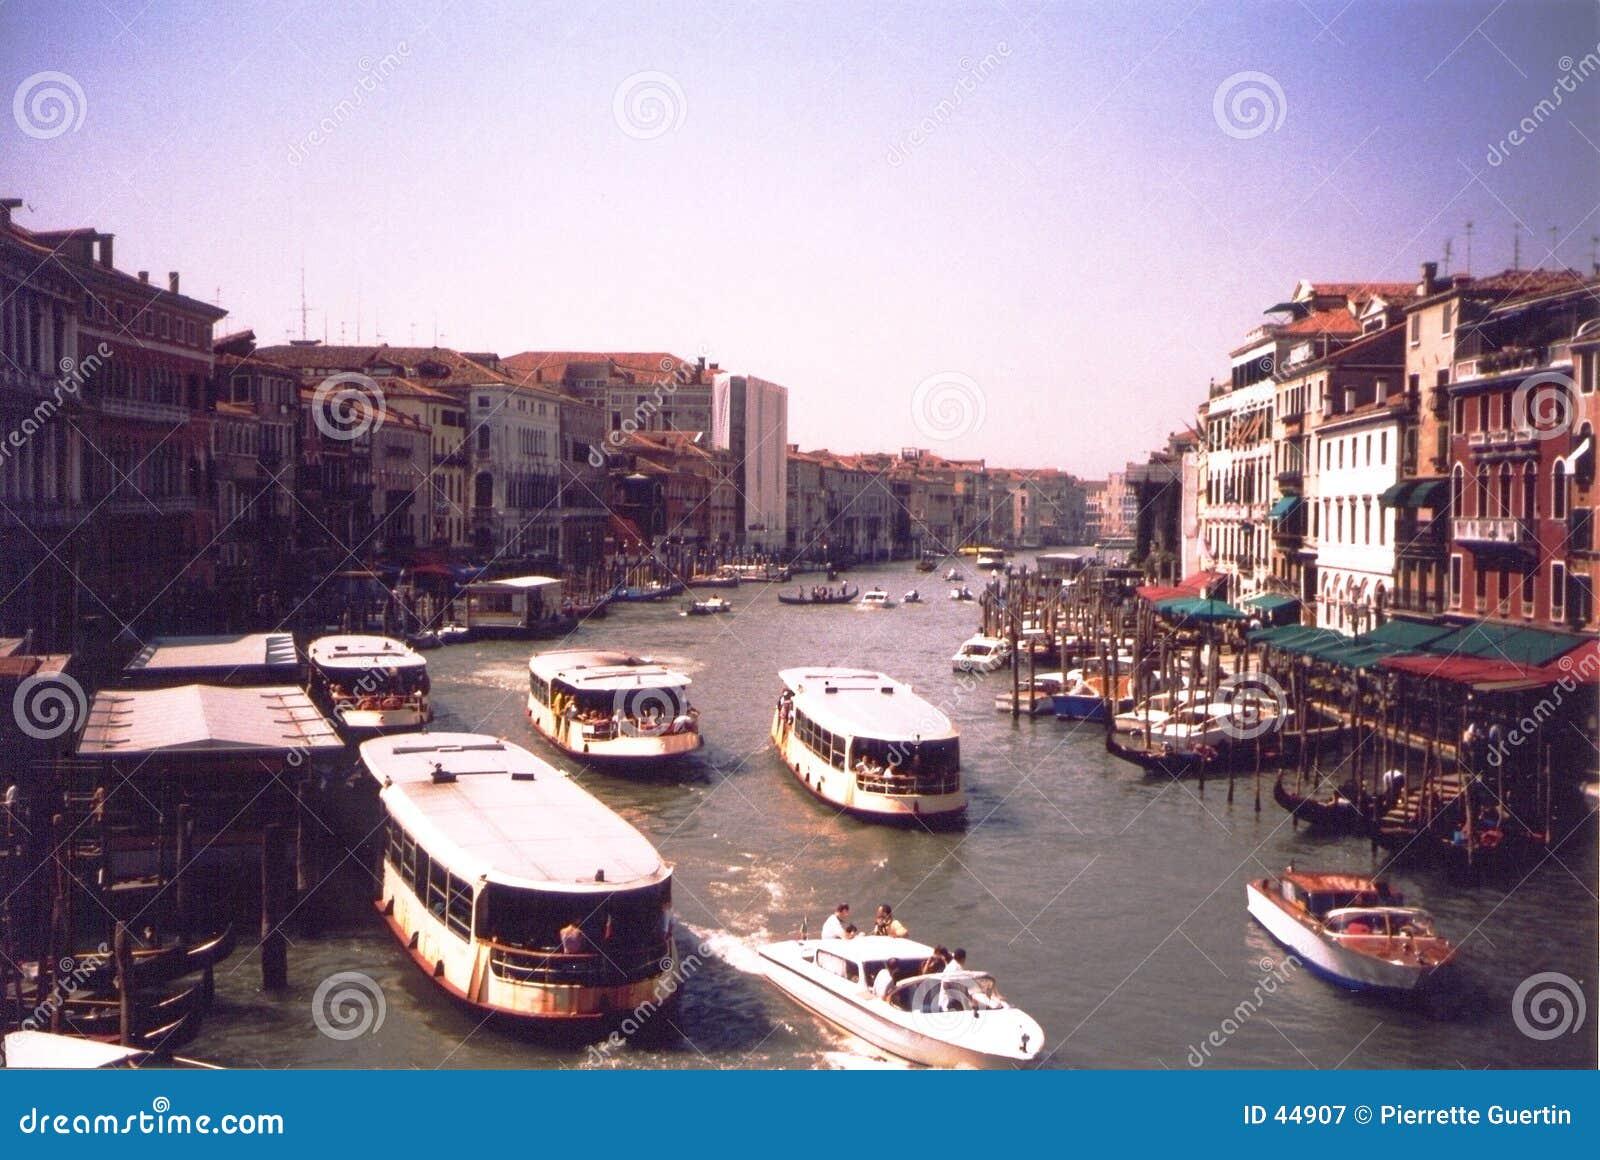 Groot kanaal - Venetië Italië